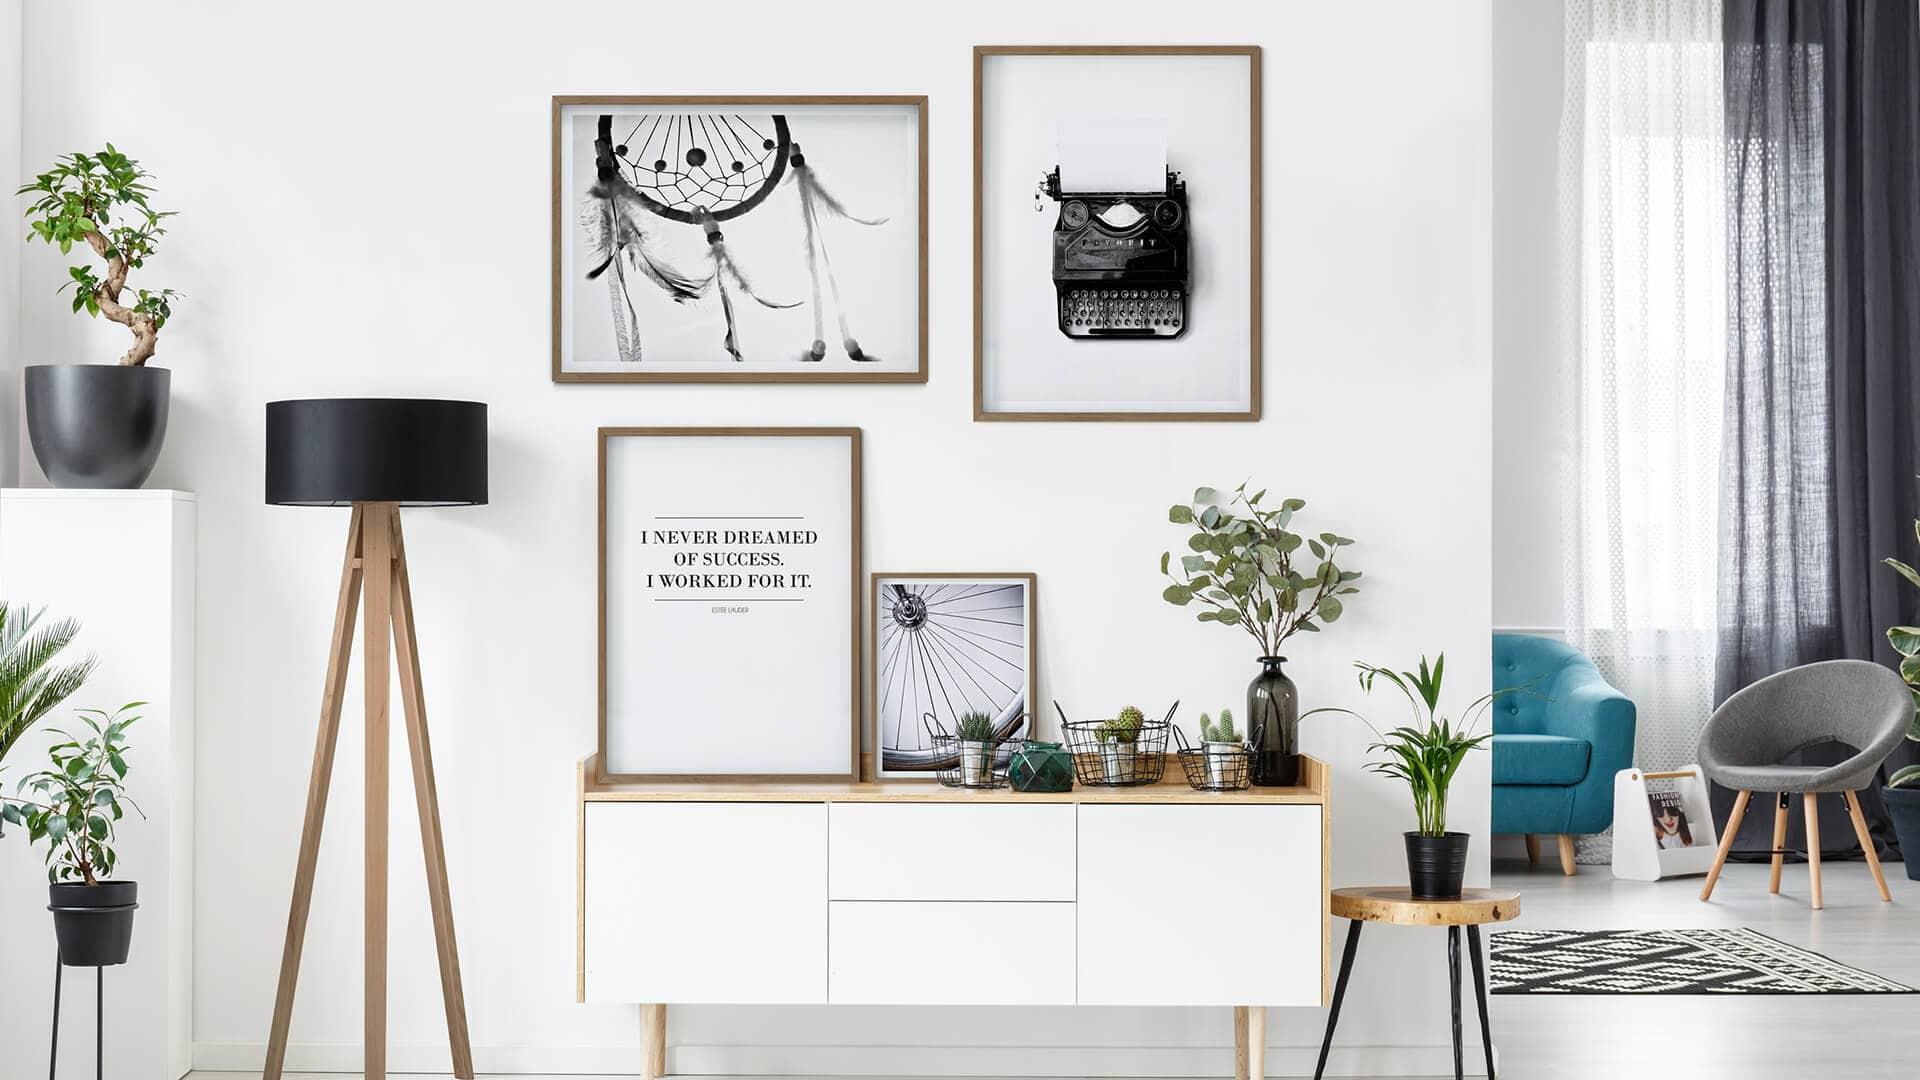 Posters In Slaapkamer : Stock fotografie hippe slaapkamer bld zoek stock